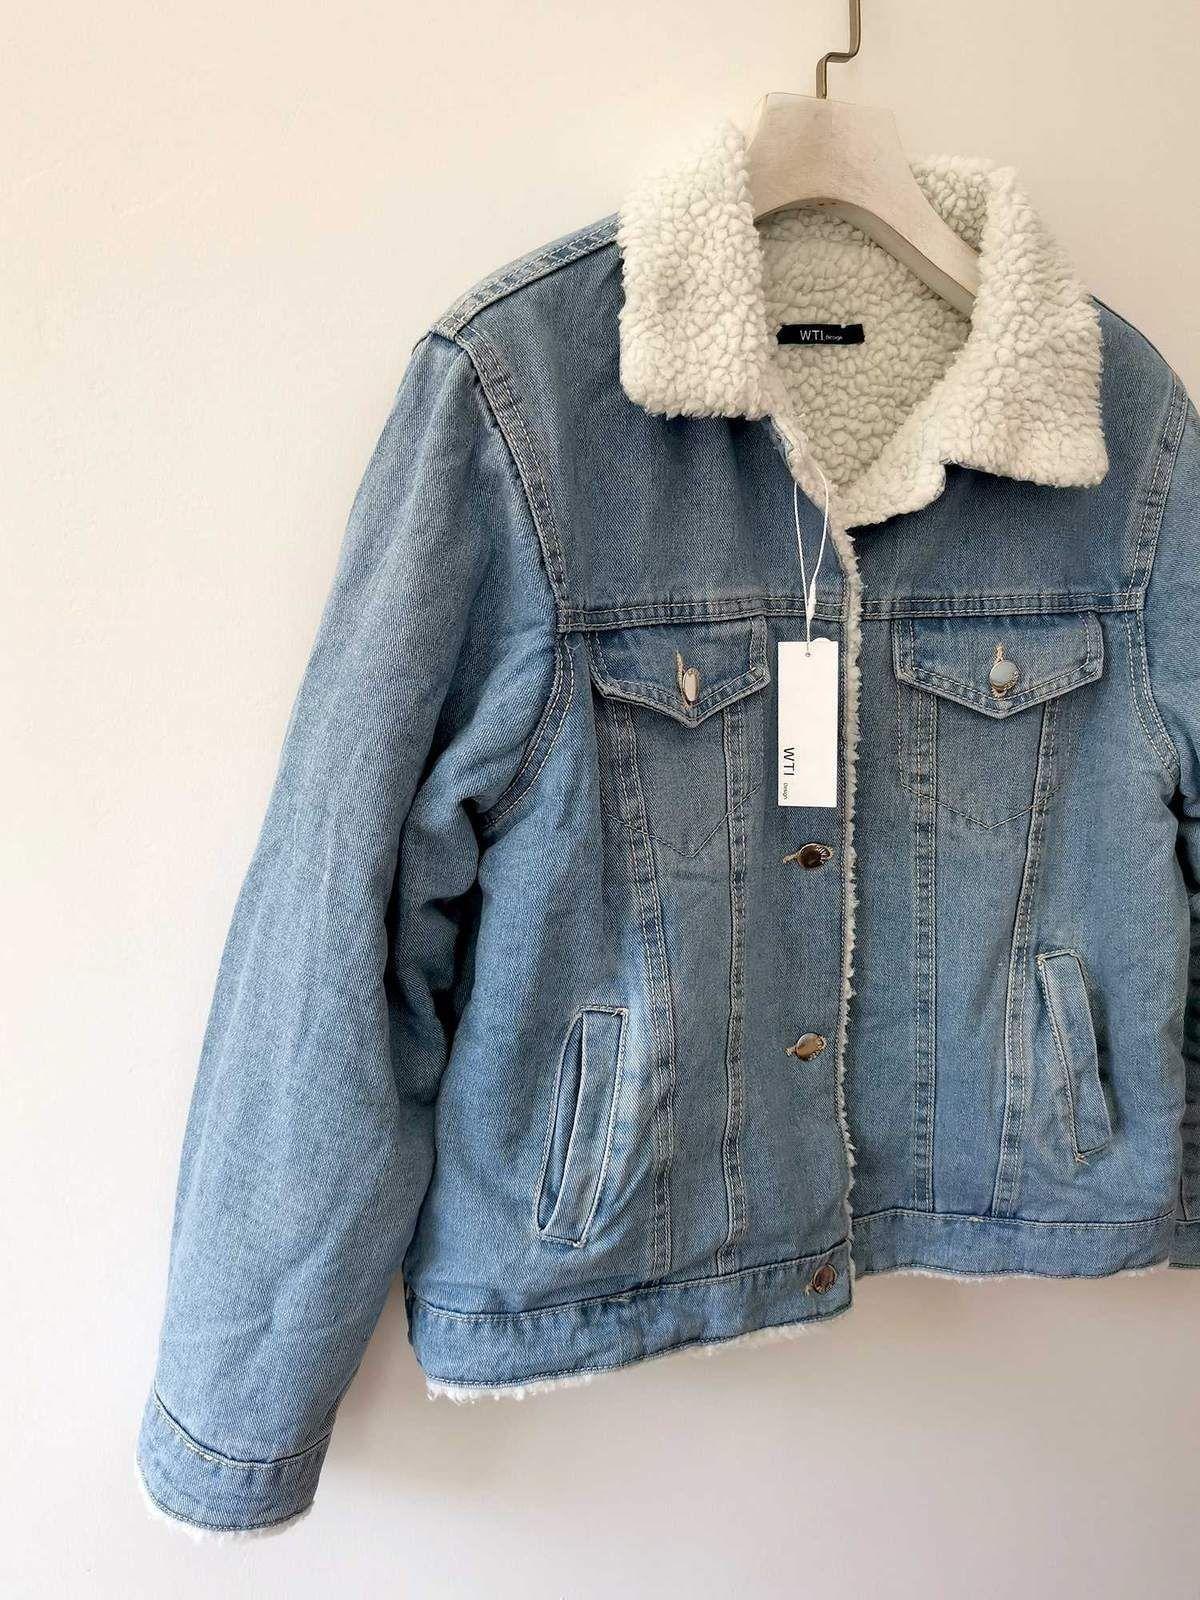 I Love These Jackets Jacket Outfit Women Fleece Denim Jacket Lined Denim Jacket [ 1600 x 1200 Pixel ]